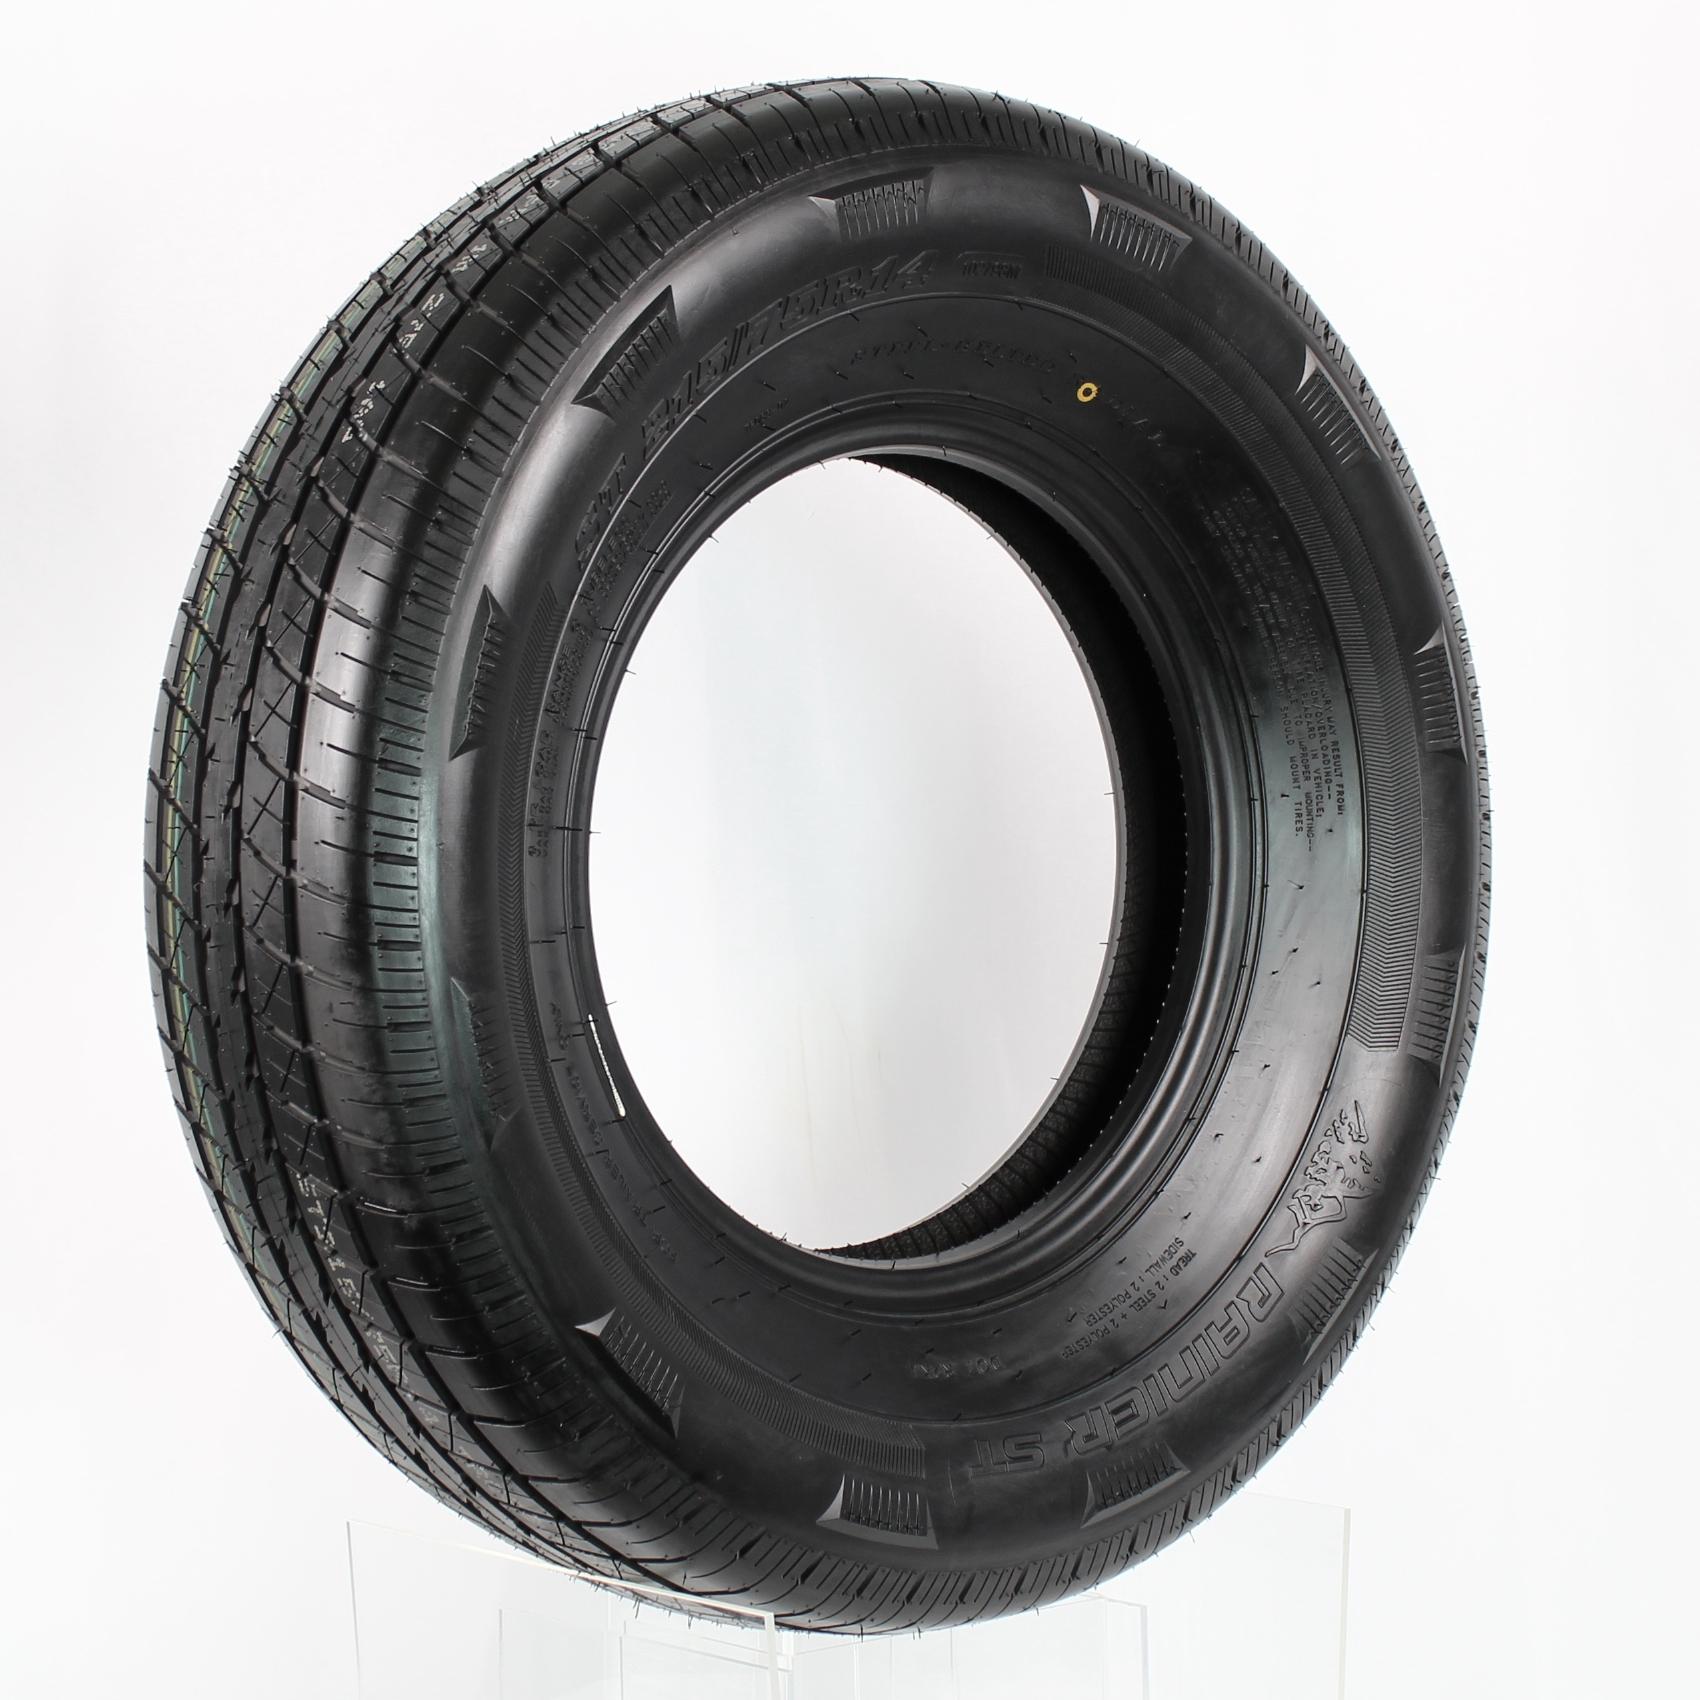 Rainier ST215/75R14 LRD 8-Ply Radial Trailer Tire Image